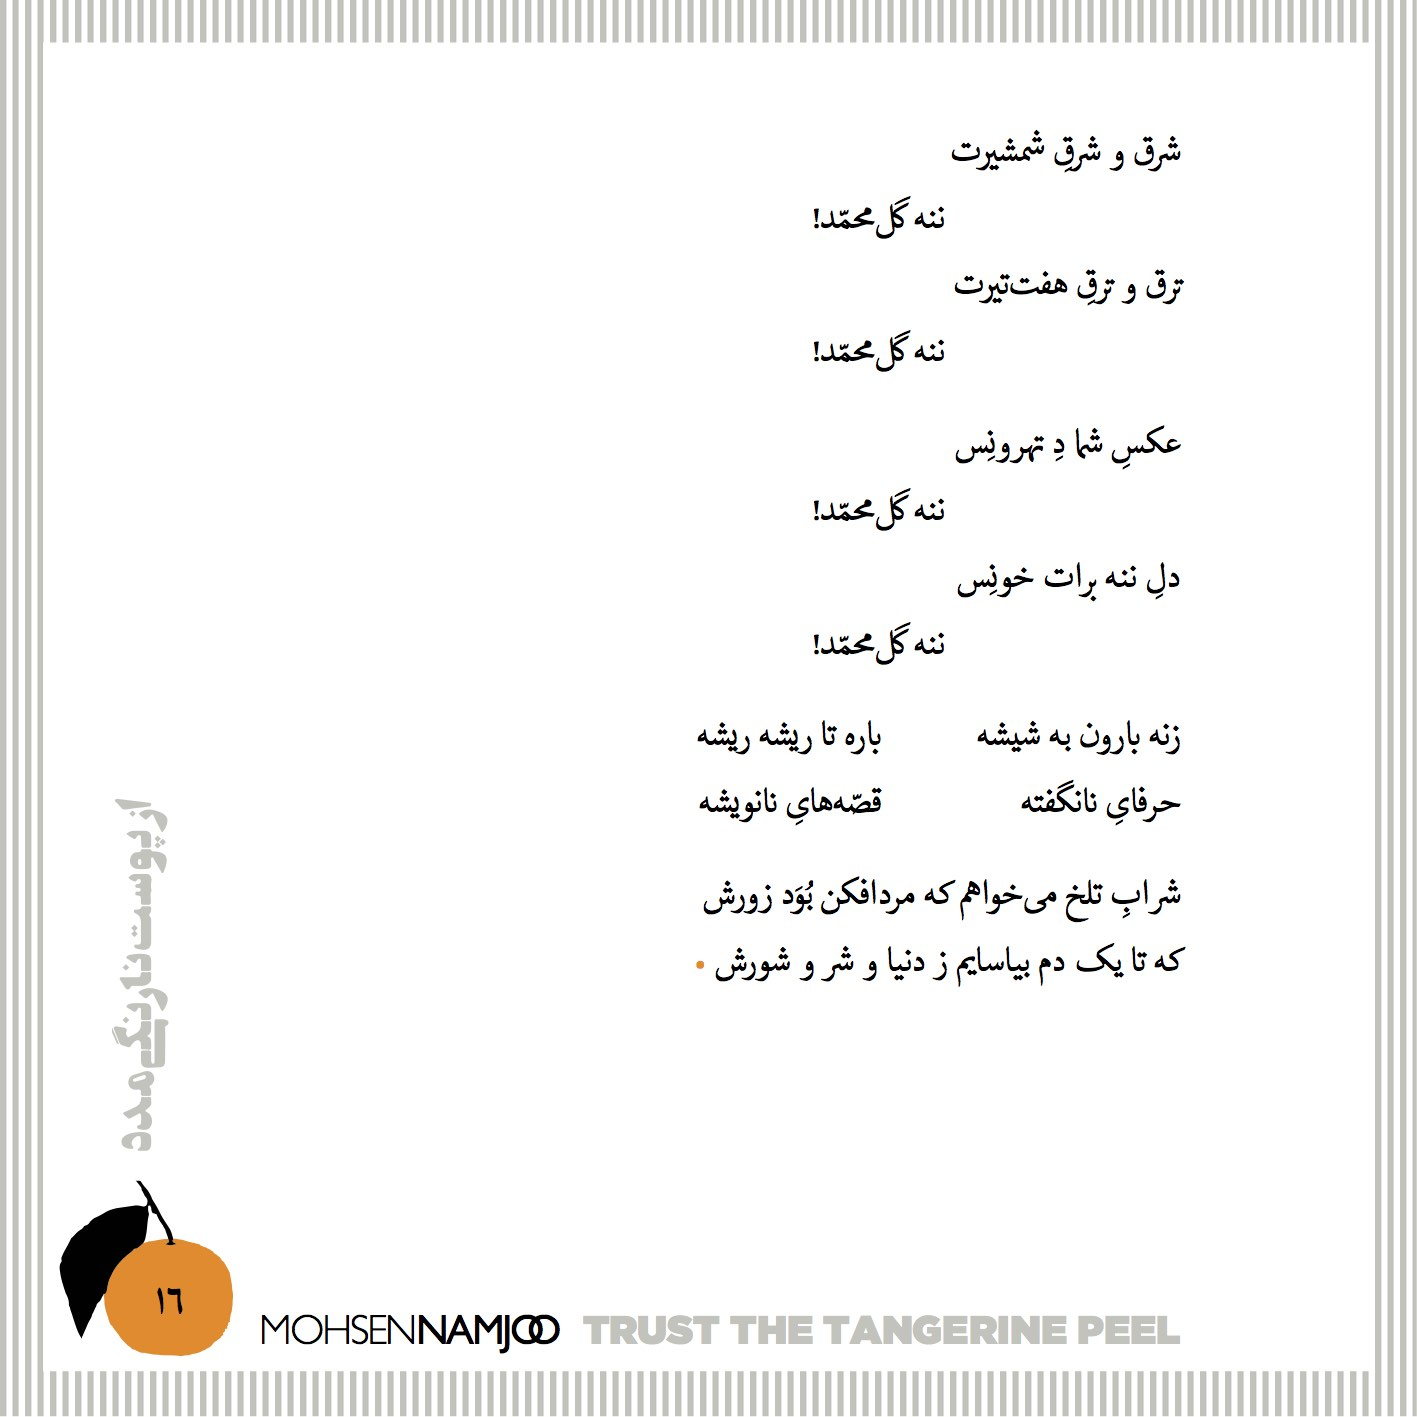 17-Trust the Tangerine Peel Final.jpg